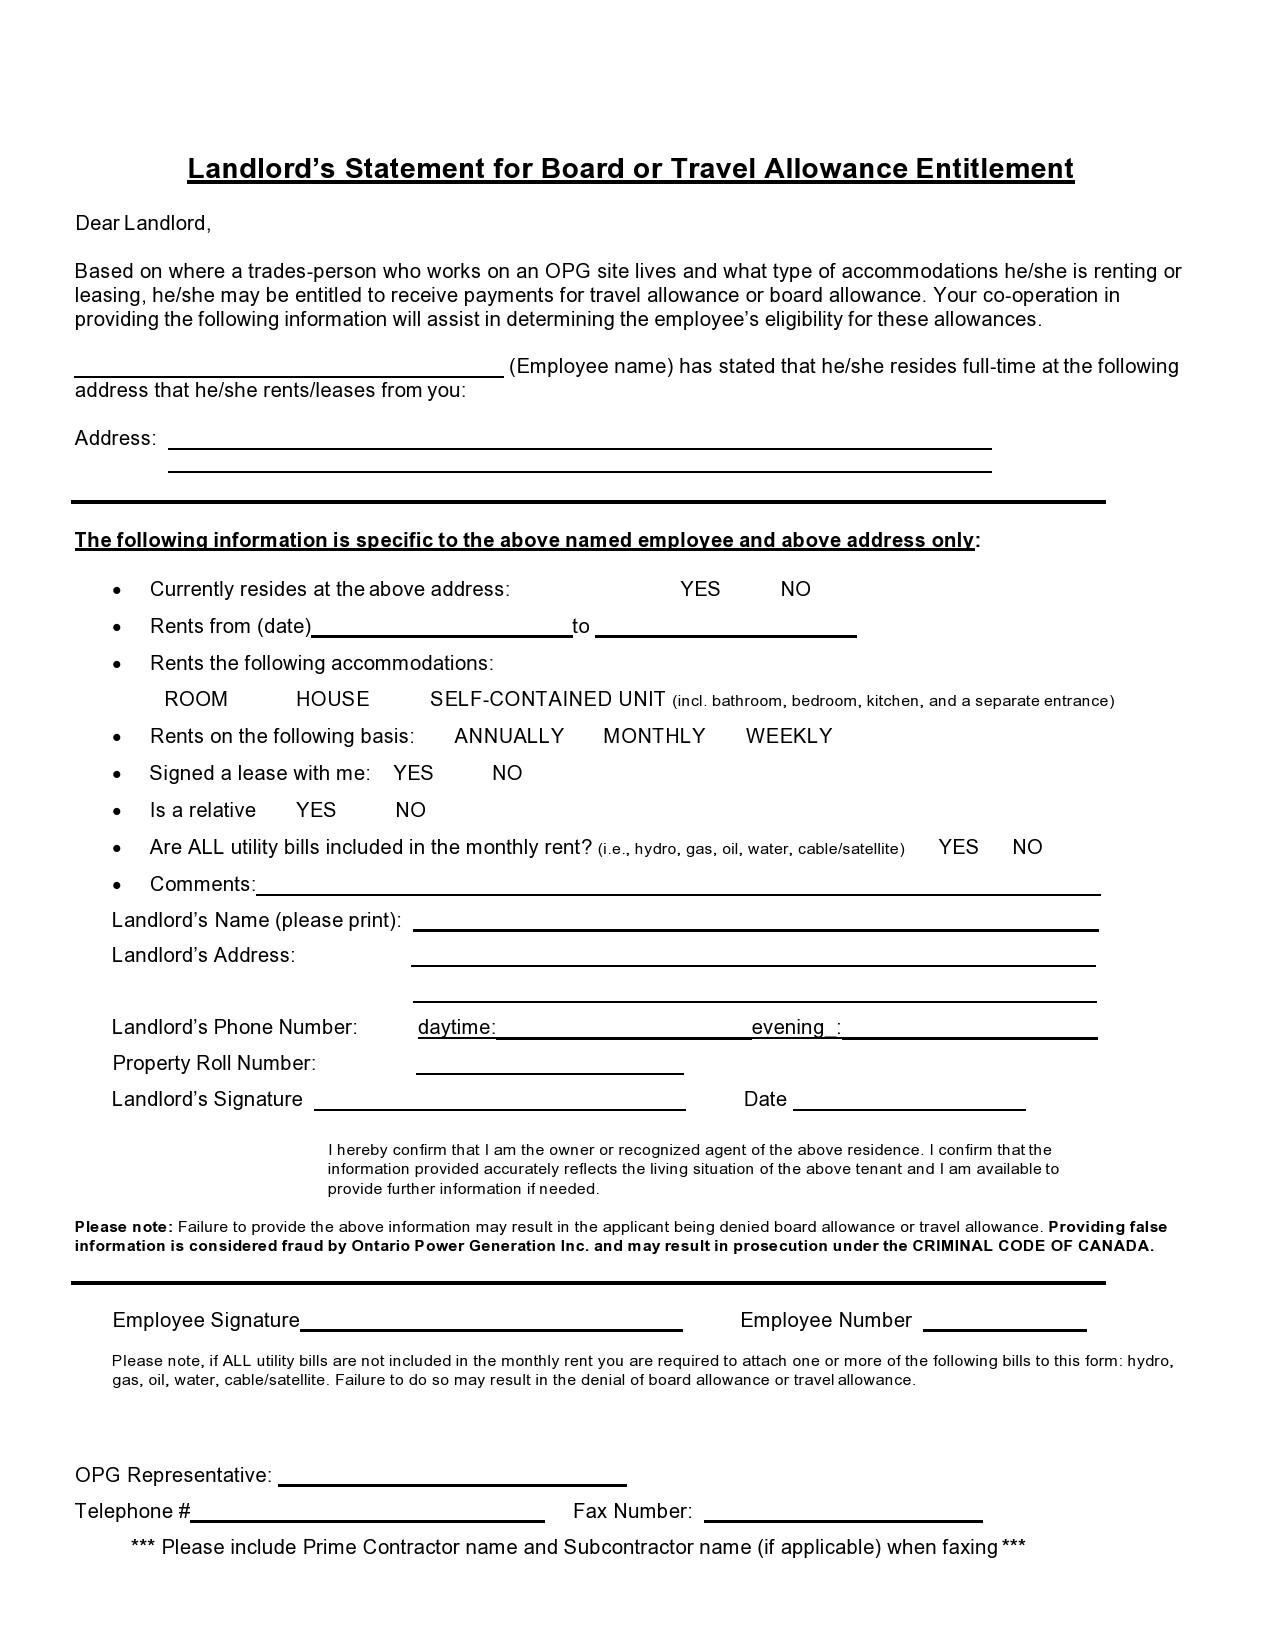 Free landlord statment 11